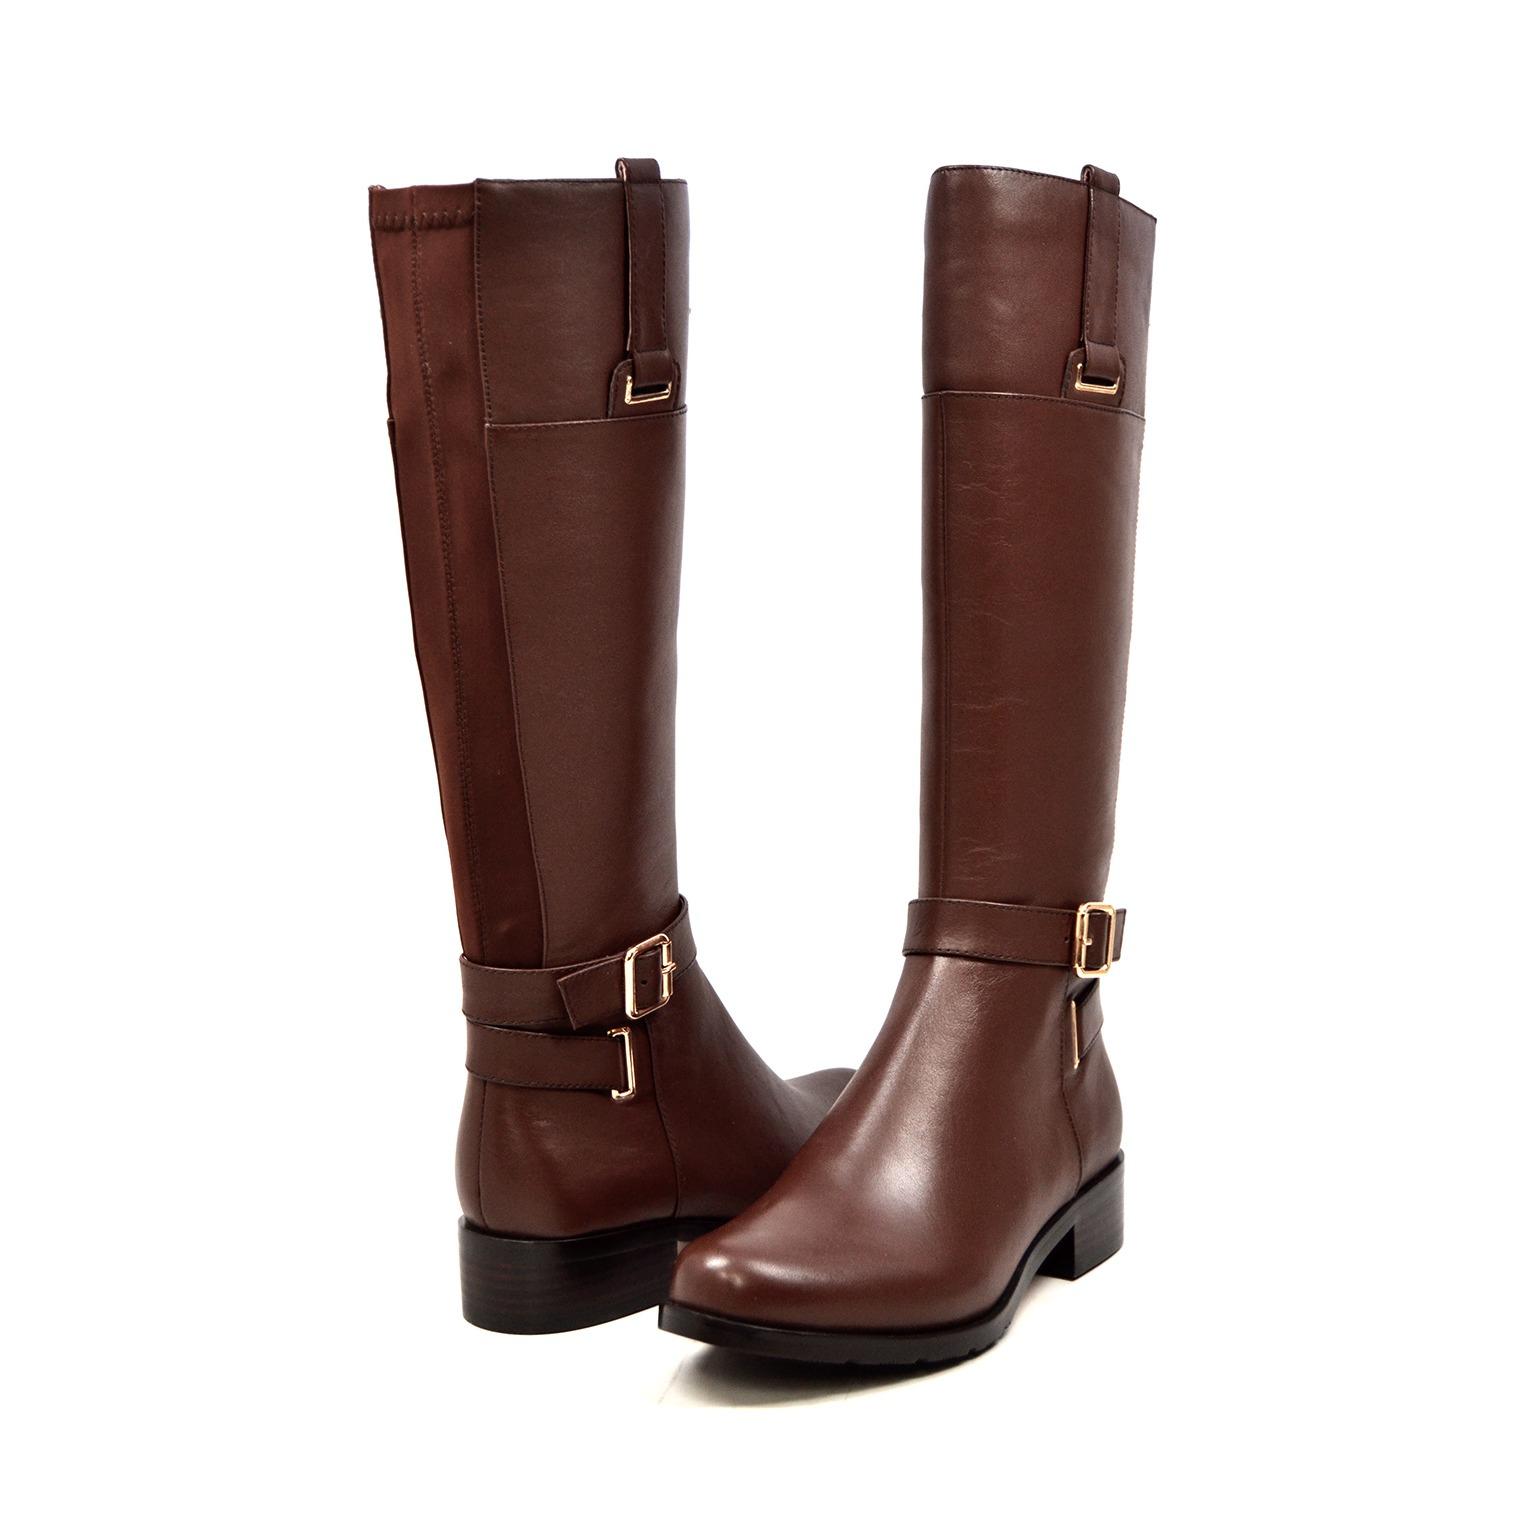 Bodycon dress knee high boots narrow calves like chadwicks